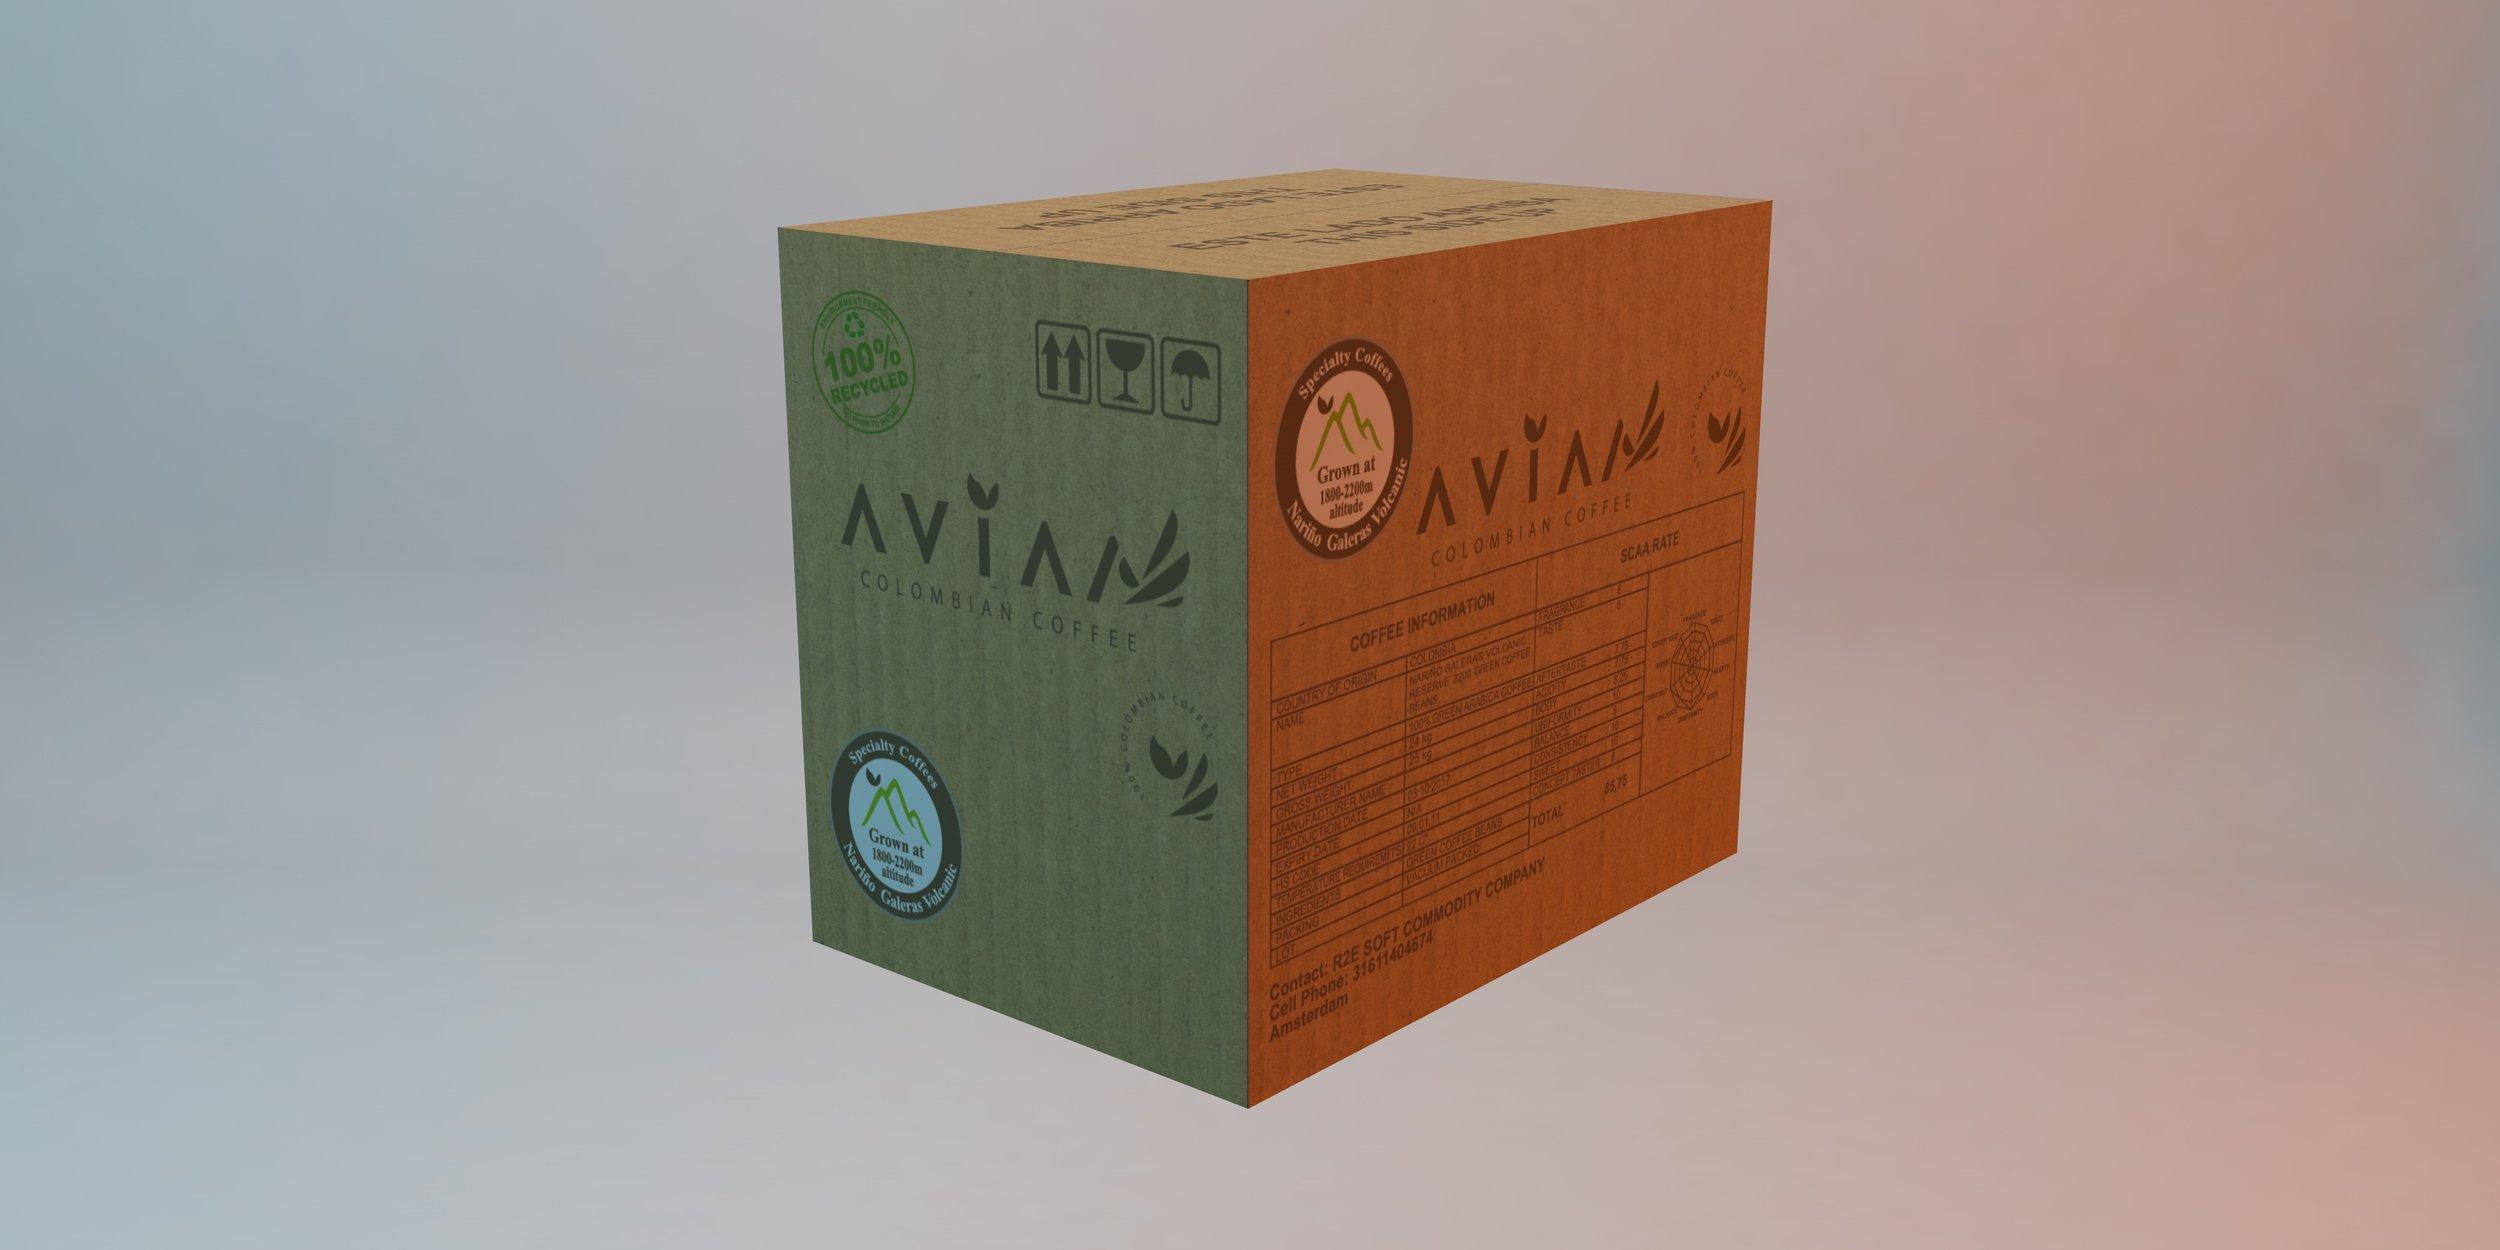 24 kg BOX - 2 vacuum packed units of 12 kilos each